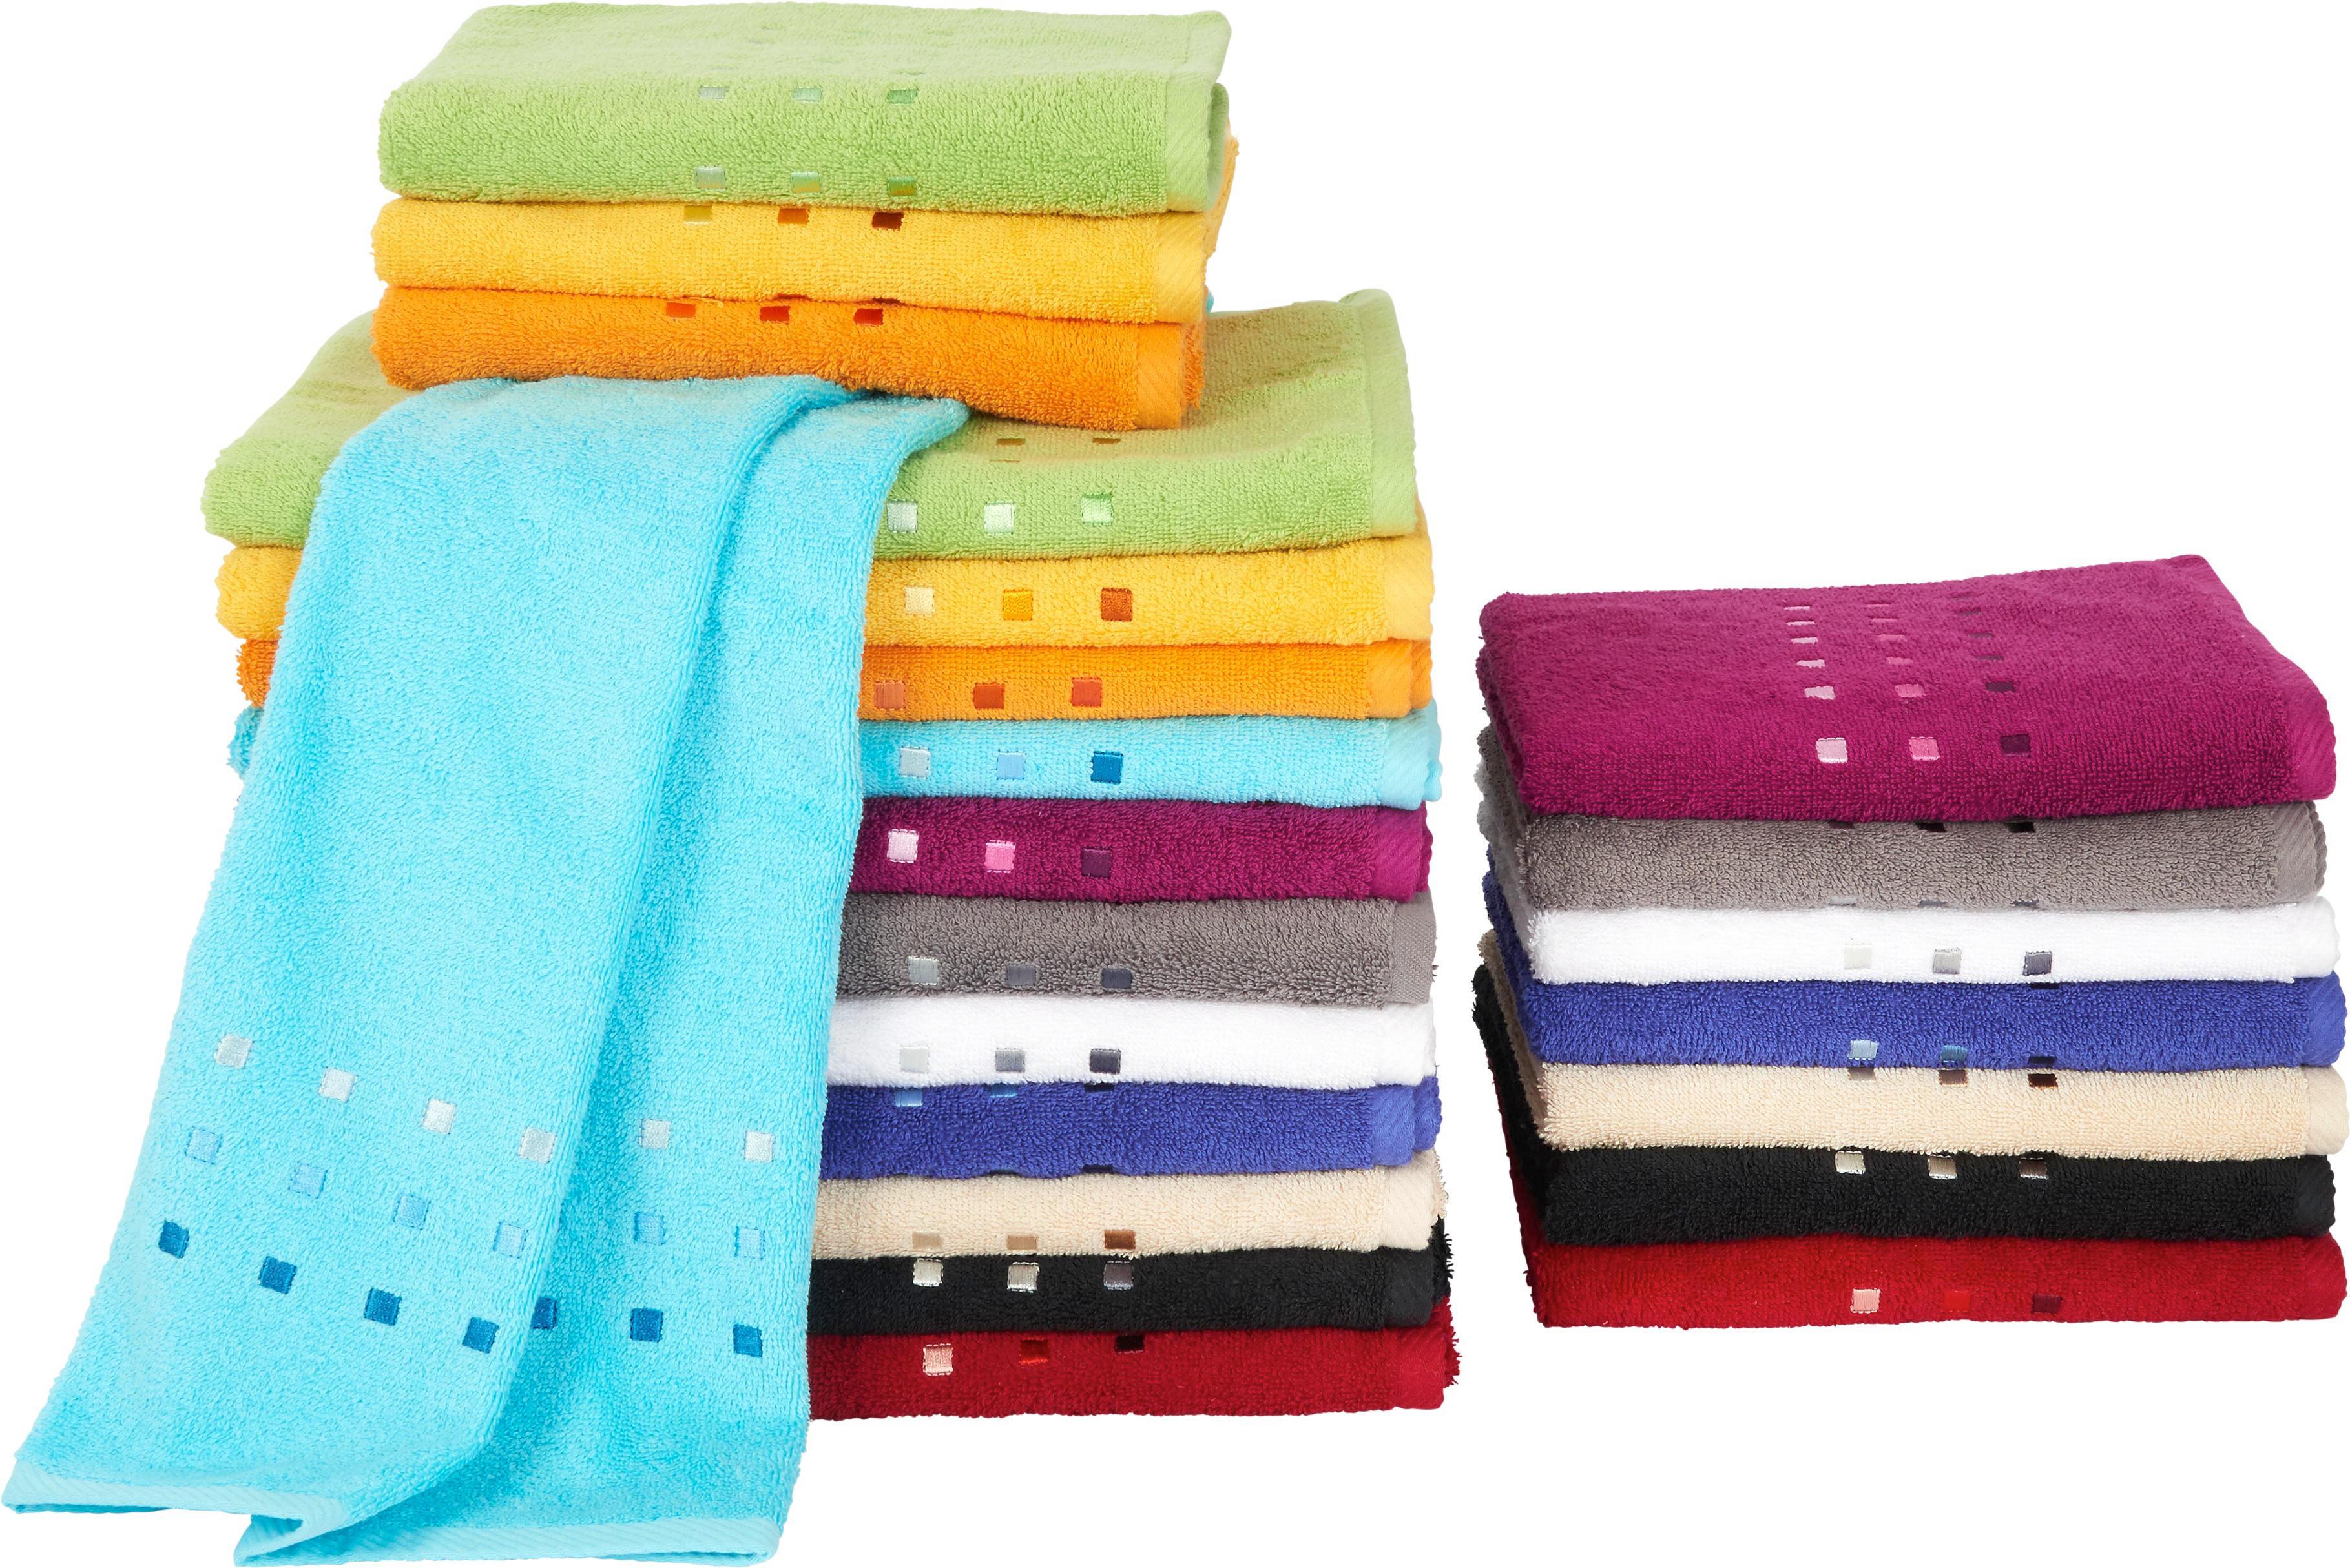 DUSCHTUCH 70/140 cm - Türkis, Basics, Textil (70/140cm) - ESPOSA